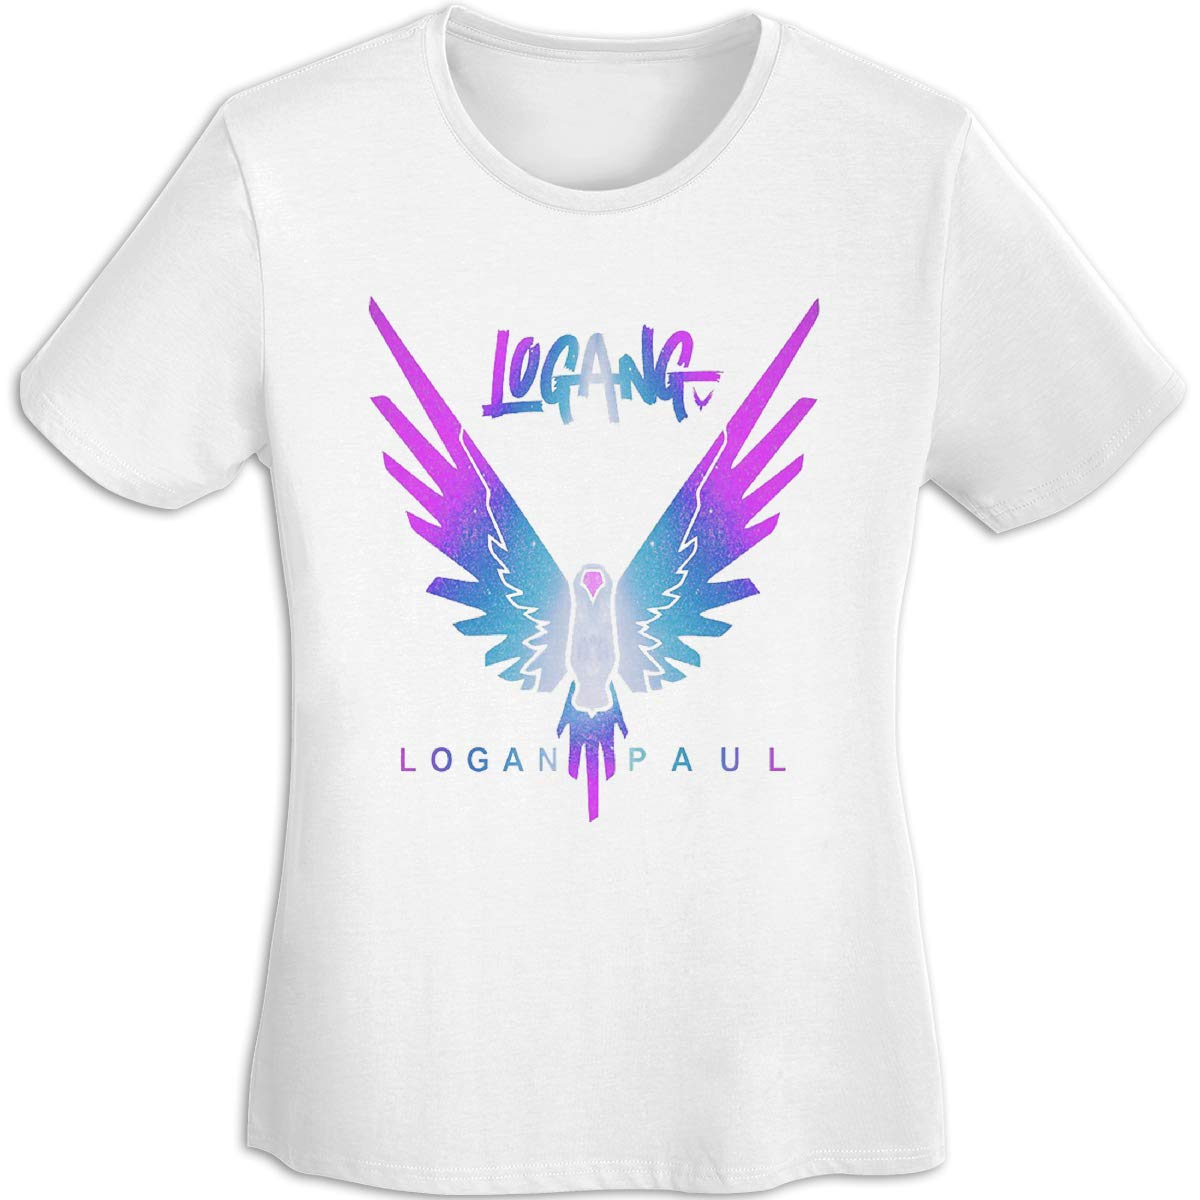 Women's T Shirt Jake Paul Logang Logan Paul Maverick Tee Shirts T-Shirt Short-Sleeve Round Neck Tshirt for Womens Girls White S by BKashy